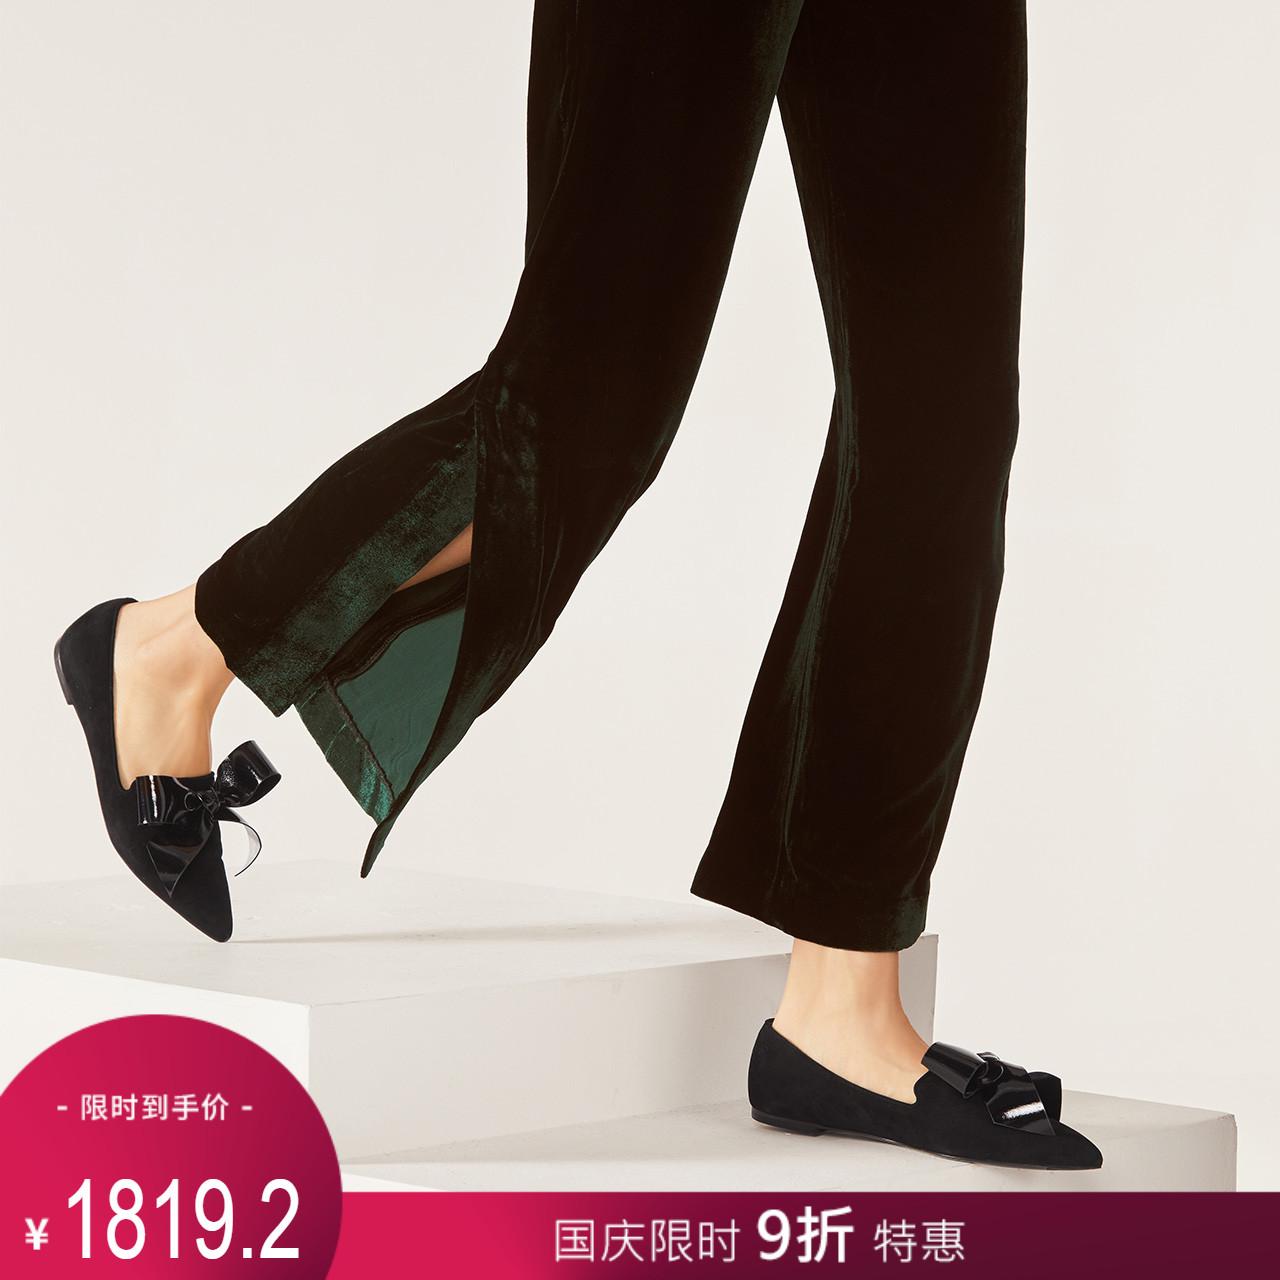 STELLA LUNA女鞋春夏漆皮蝴蝶结平跟单鞋女SH334L24046